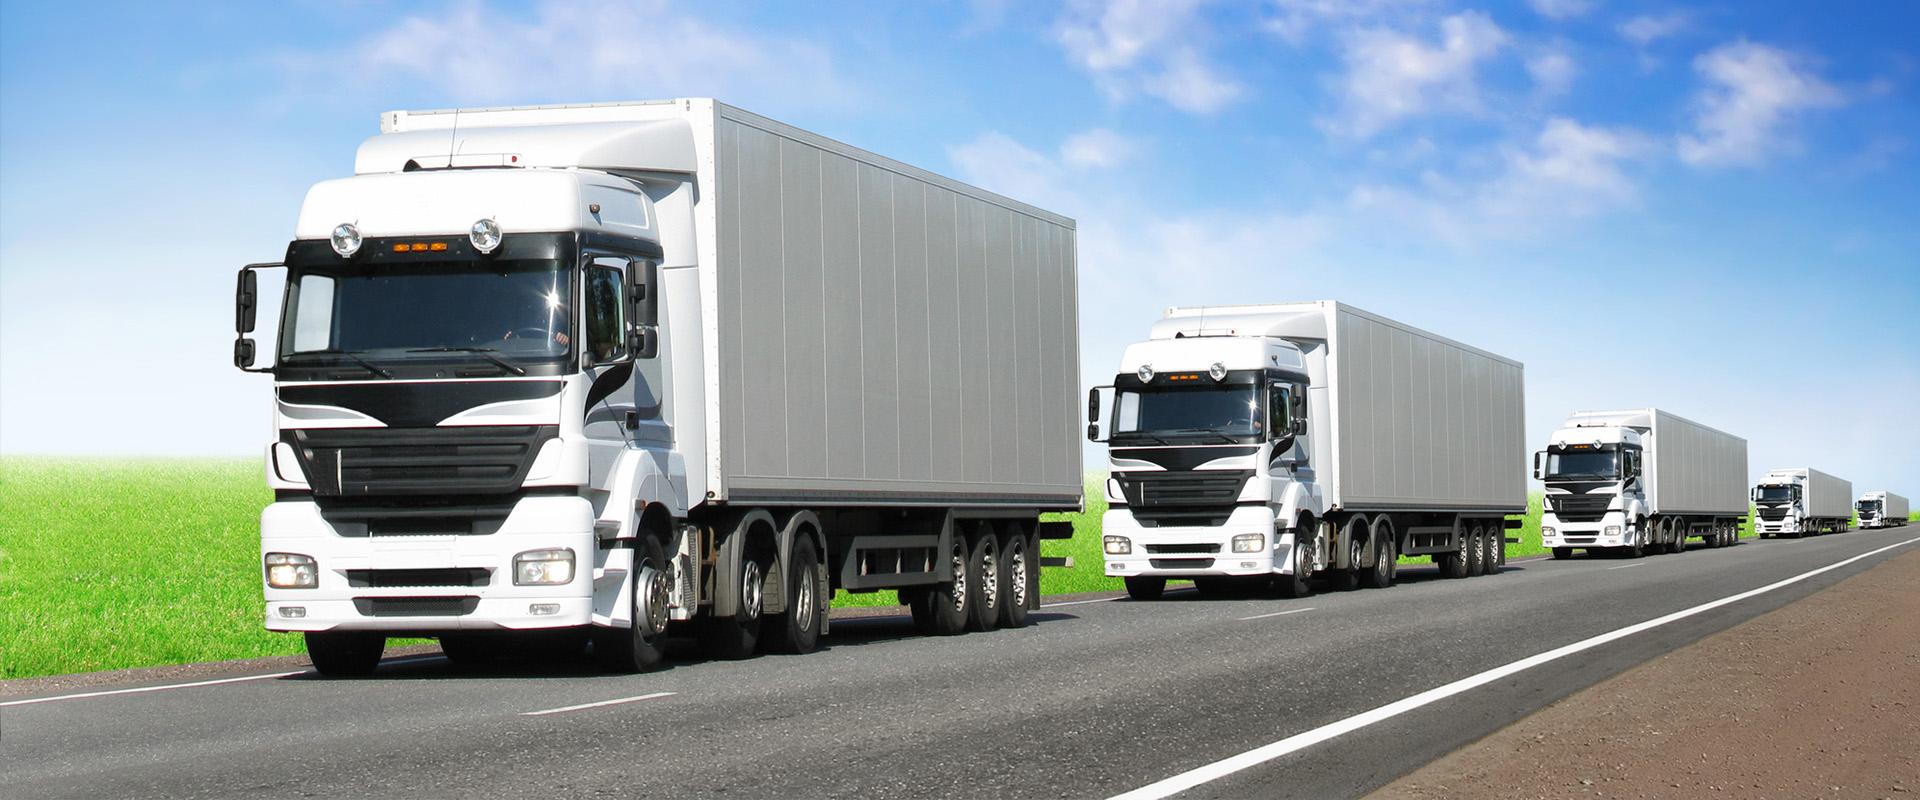 Kako da sprečite prekomernu potrošnju goriva i nenamensko korišćenje vaših vozila